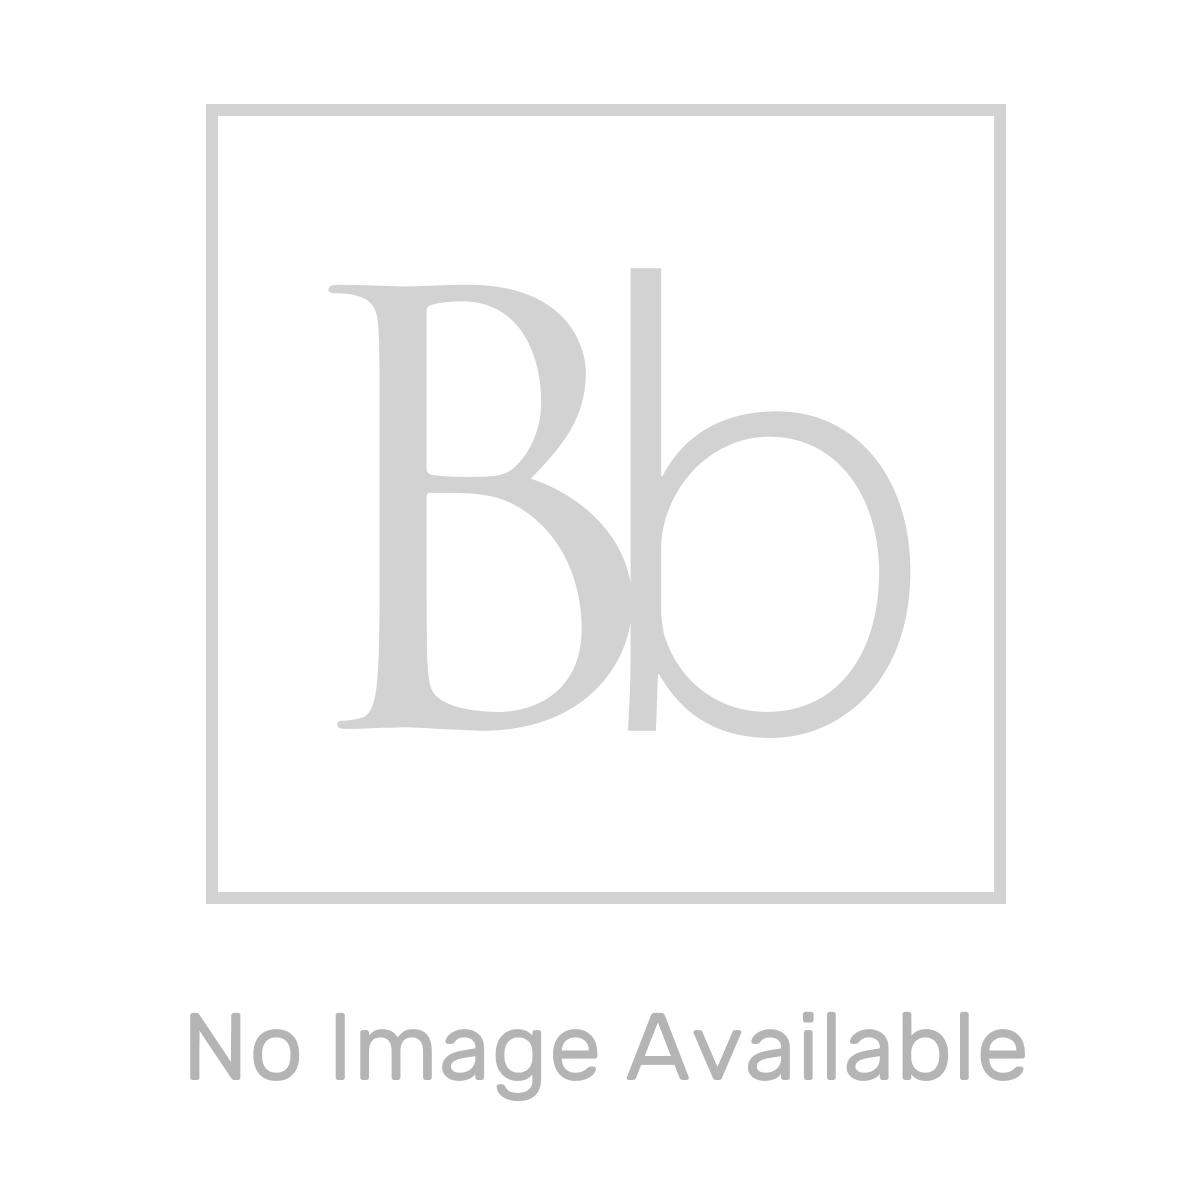 Aquadart Black Slate Shower Tray 1200 x 760 Overhead